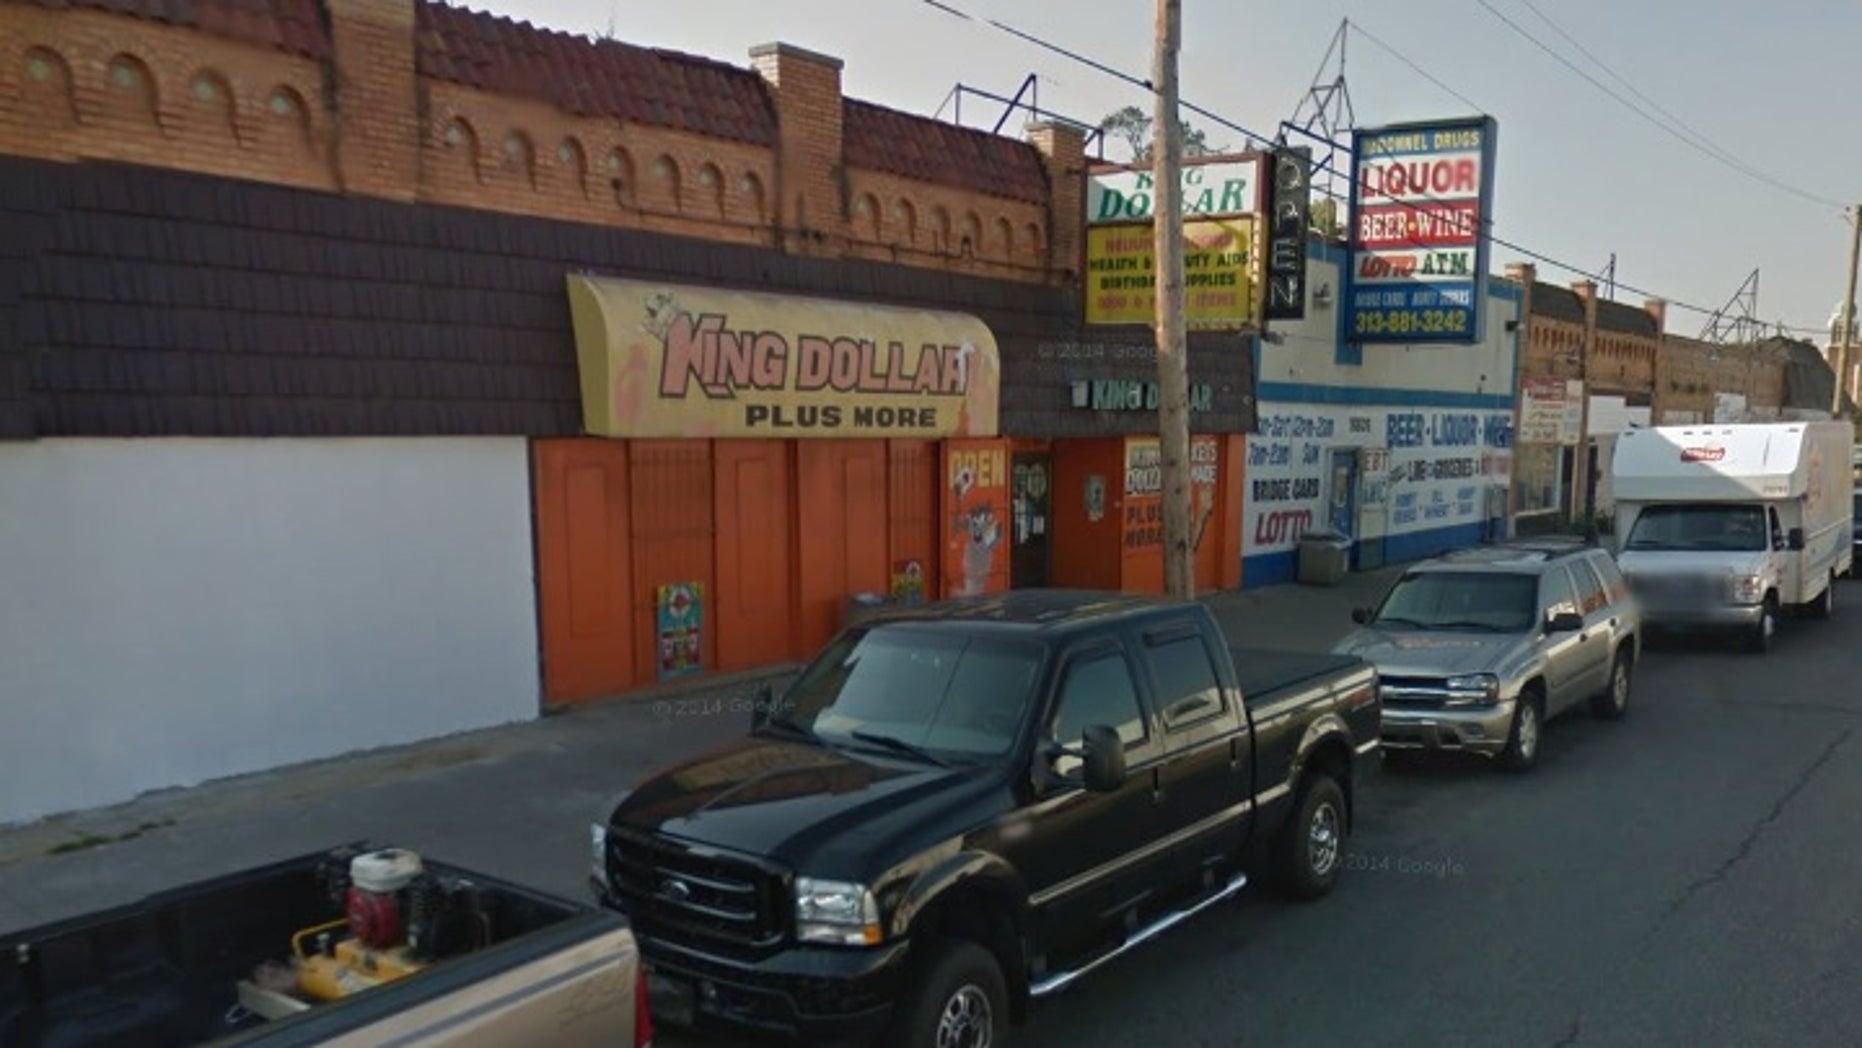 The liquor store in Detroit.